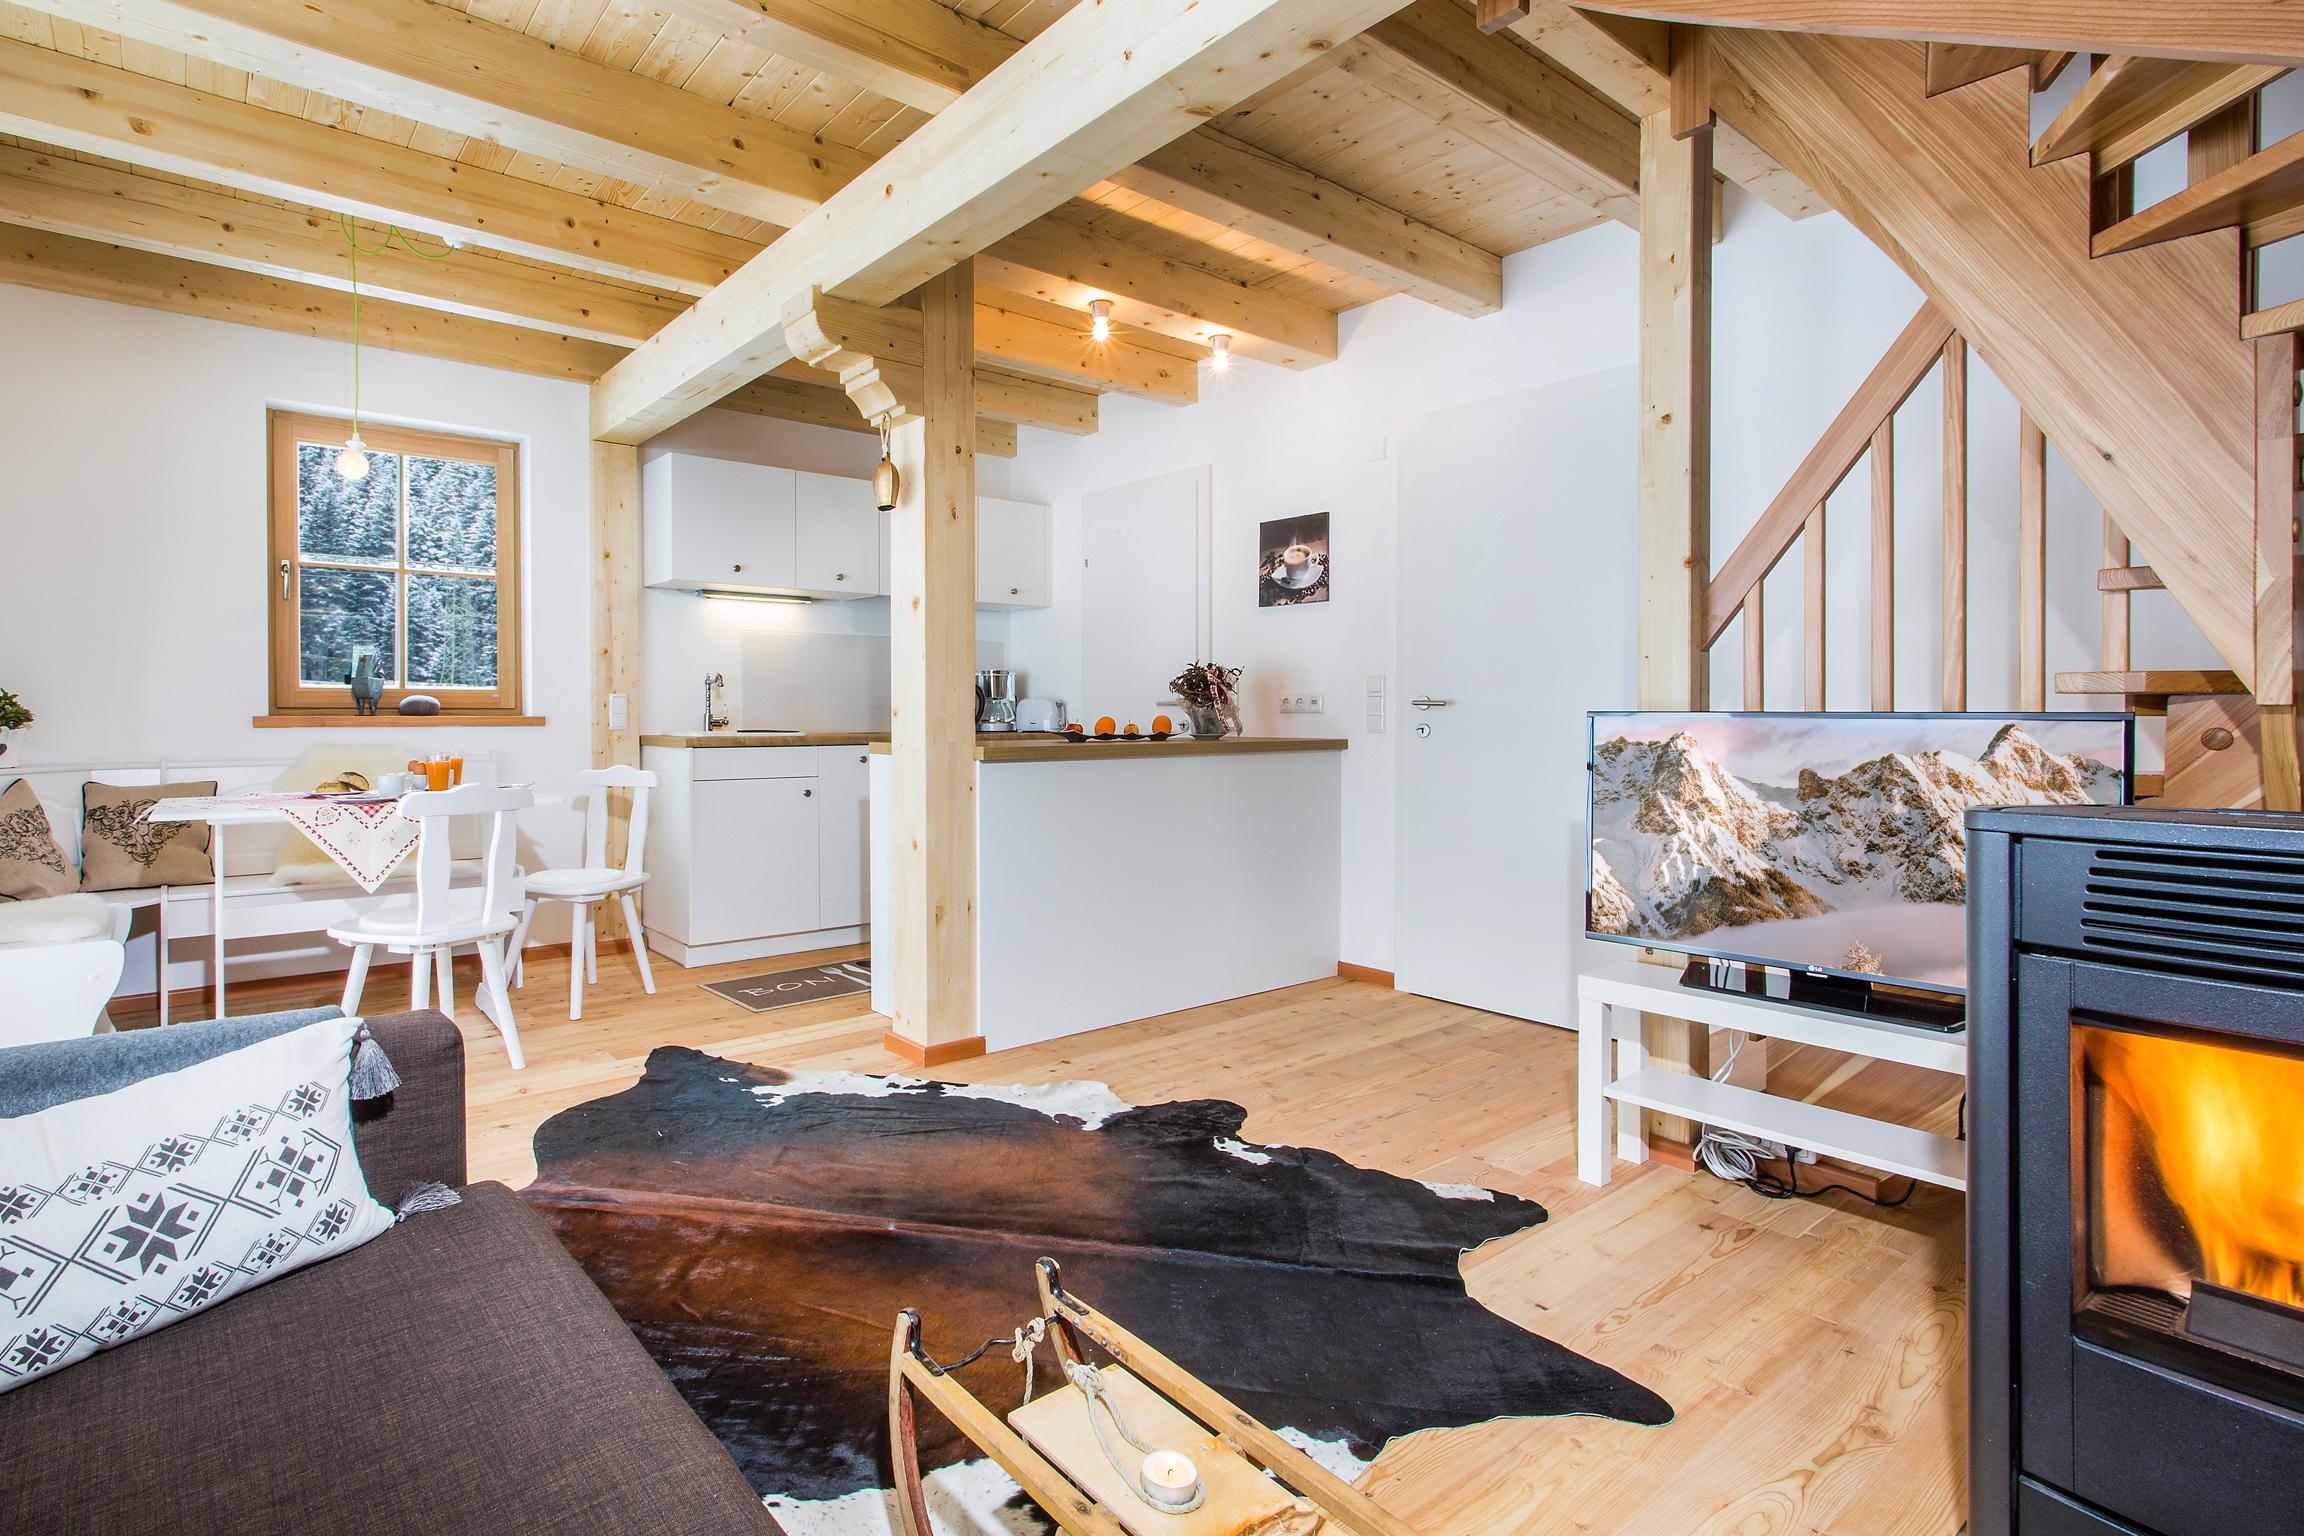 Maison de vacances Lodge Kleiner Bär direkt am Skilift (2050394), Uttendorf, Pinzgau, Salzbourg, Autriche, image 19